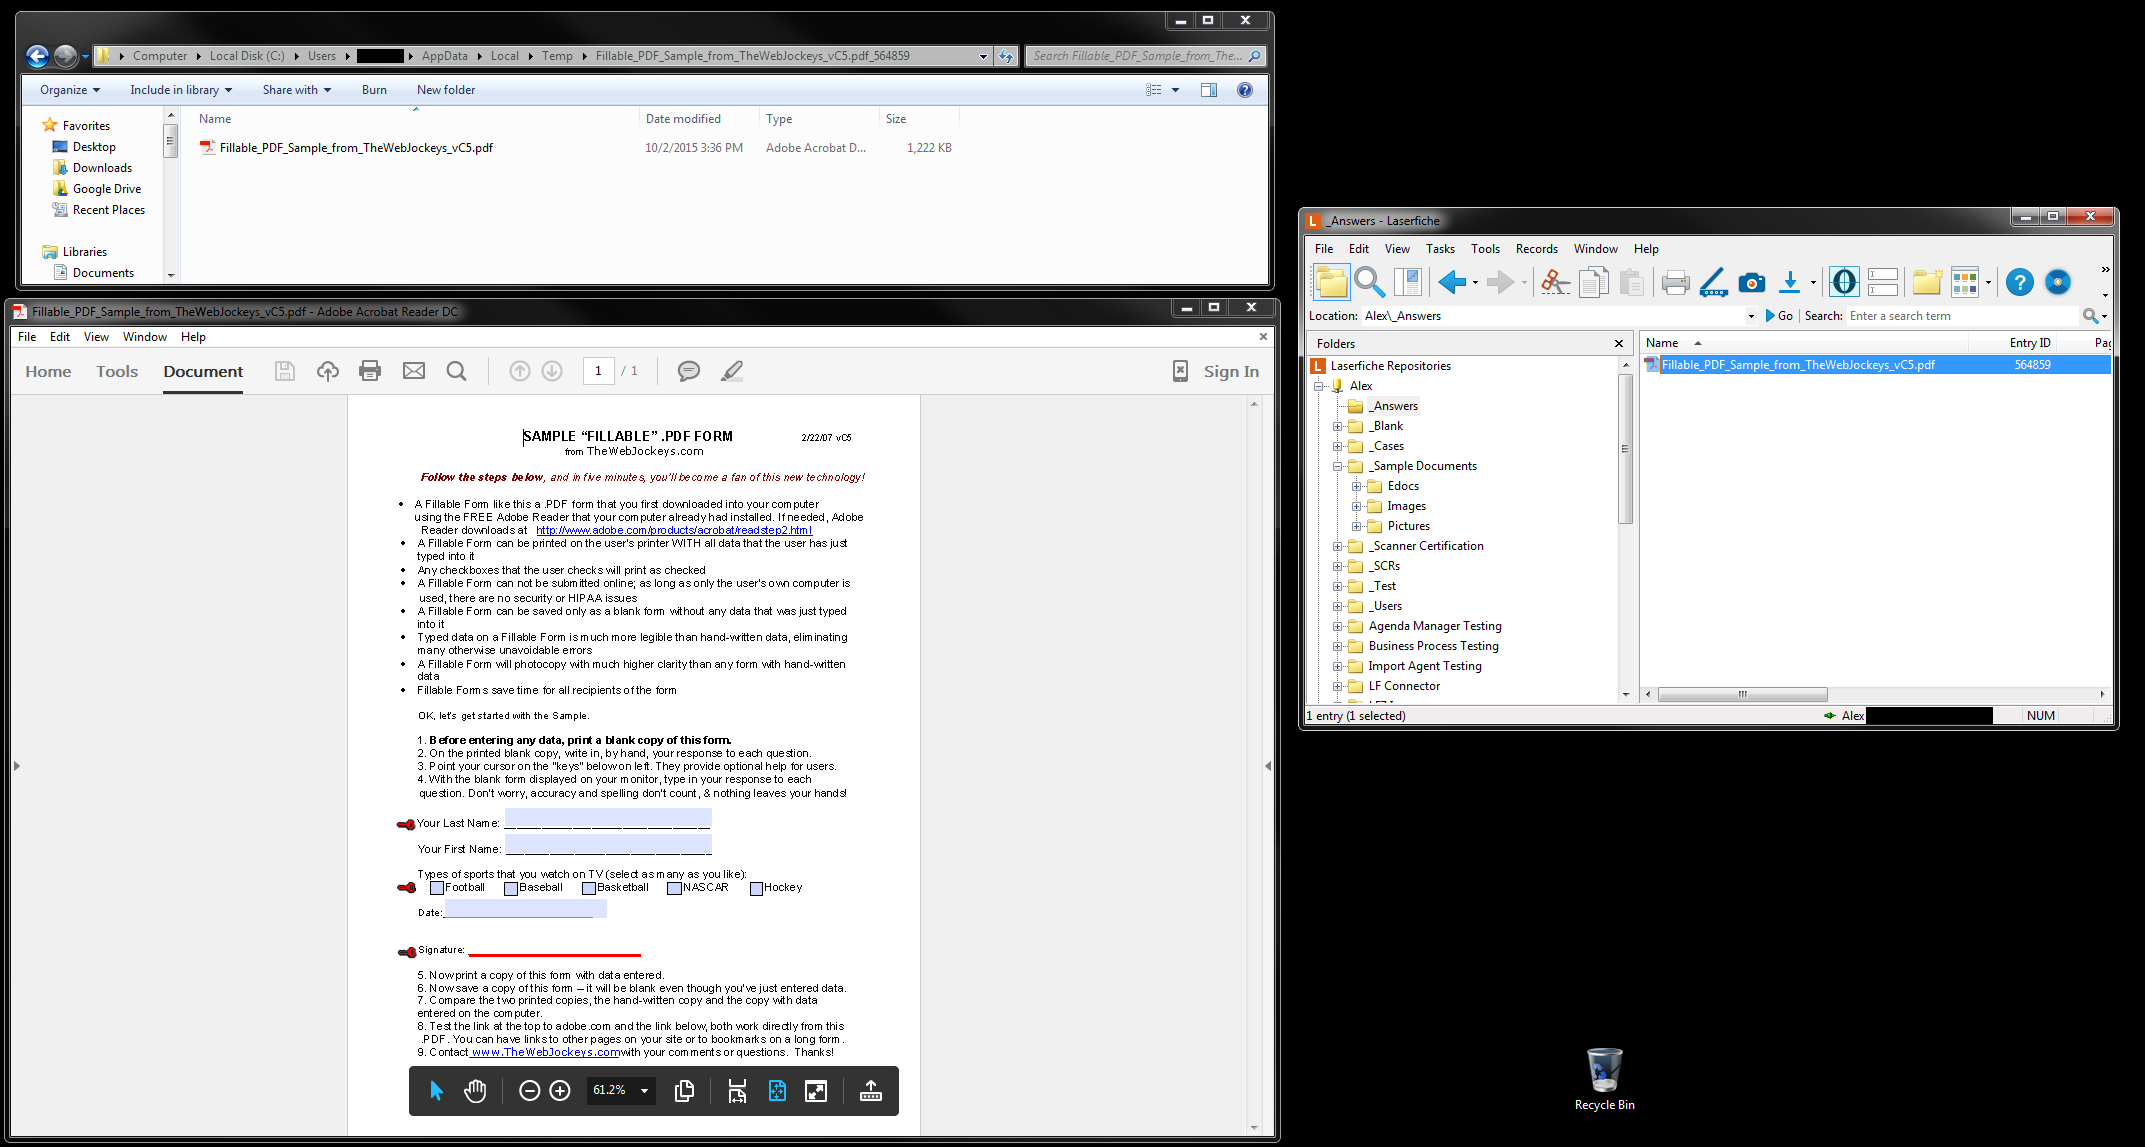 adobe reader dc marking up a pdf document